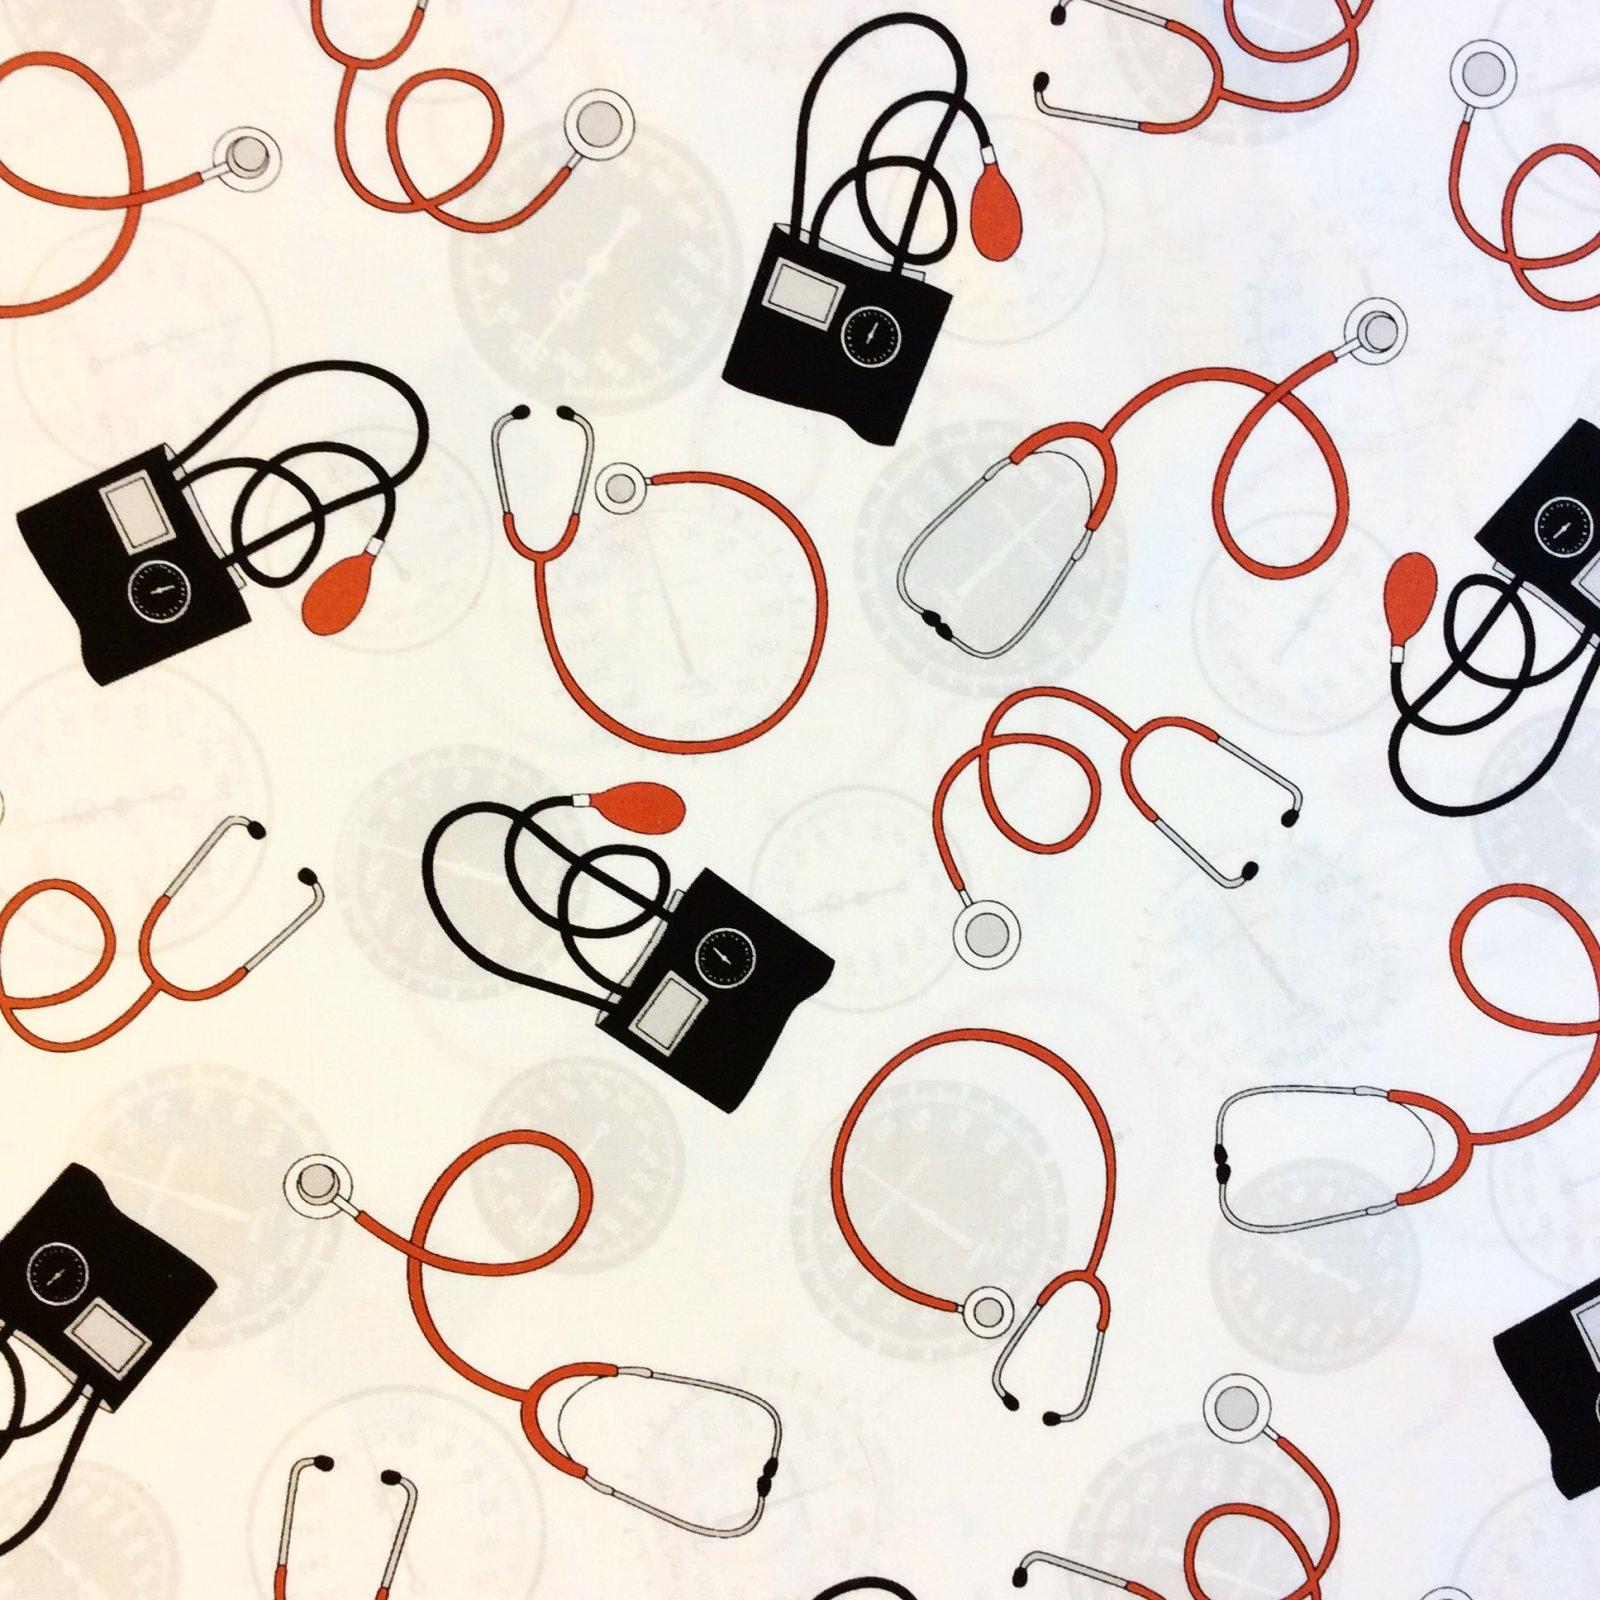 Blood Pressure Nurse Doctor Hospital Scrubs Heart Gauge Cotton Quilt Fabric WI87